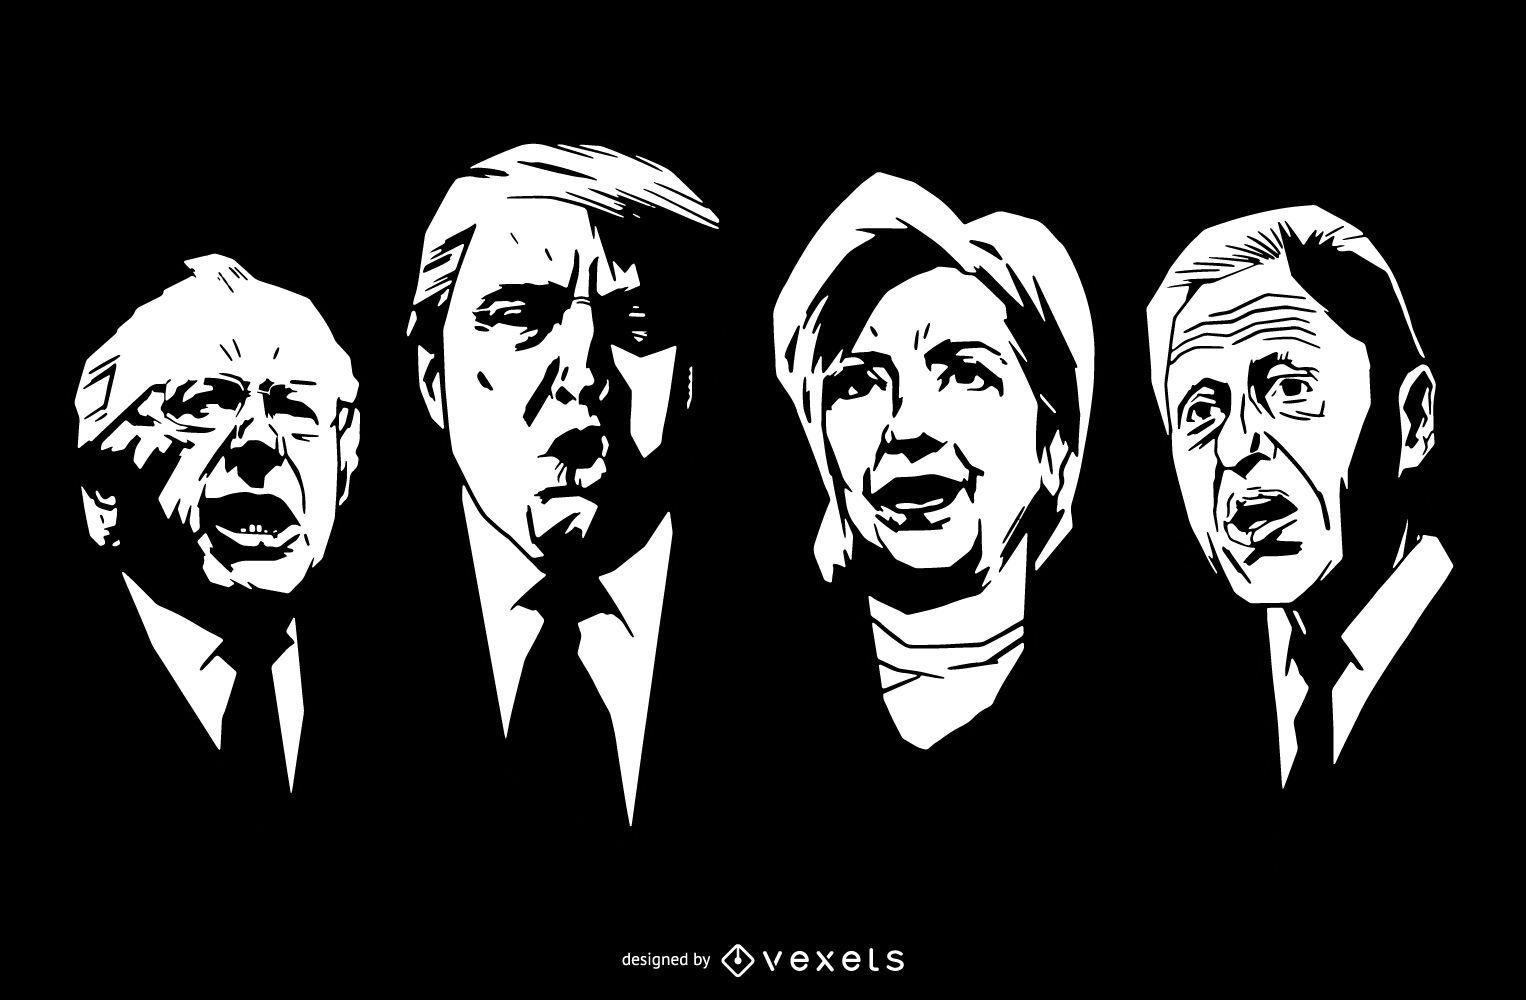 US Political Figures Stencil Design